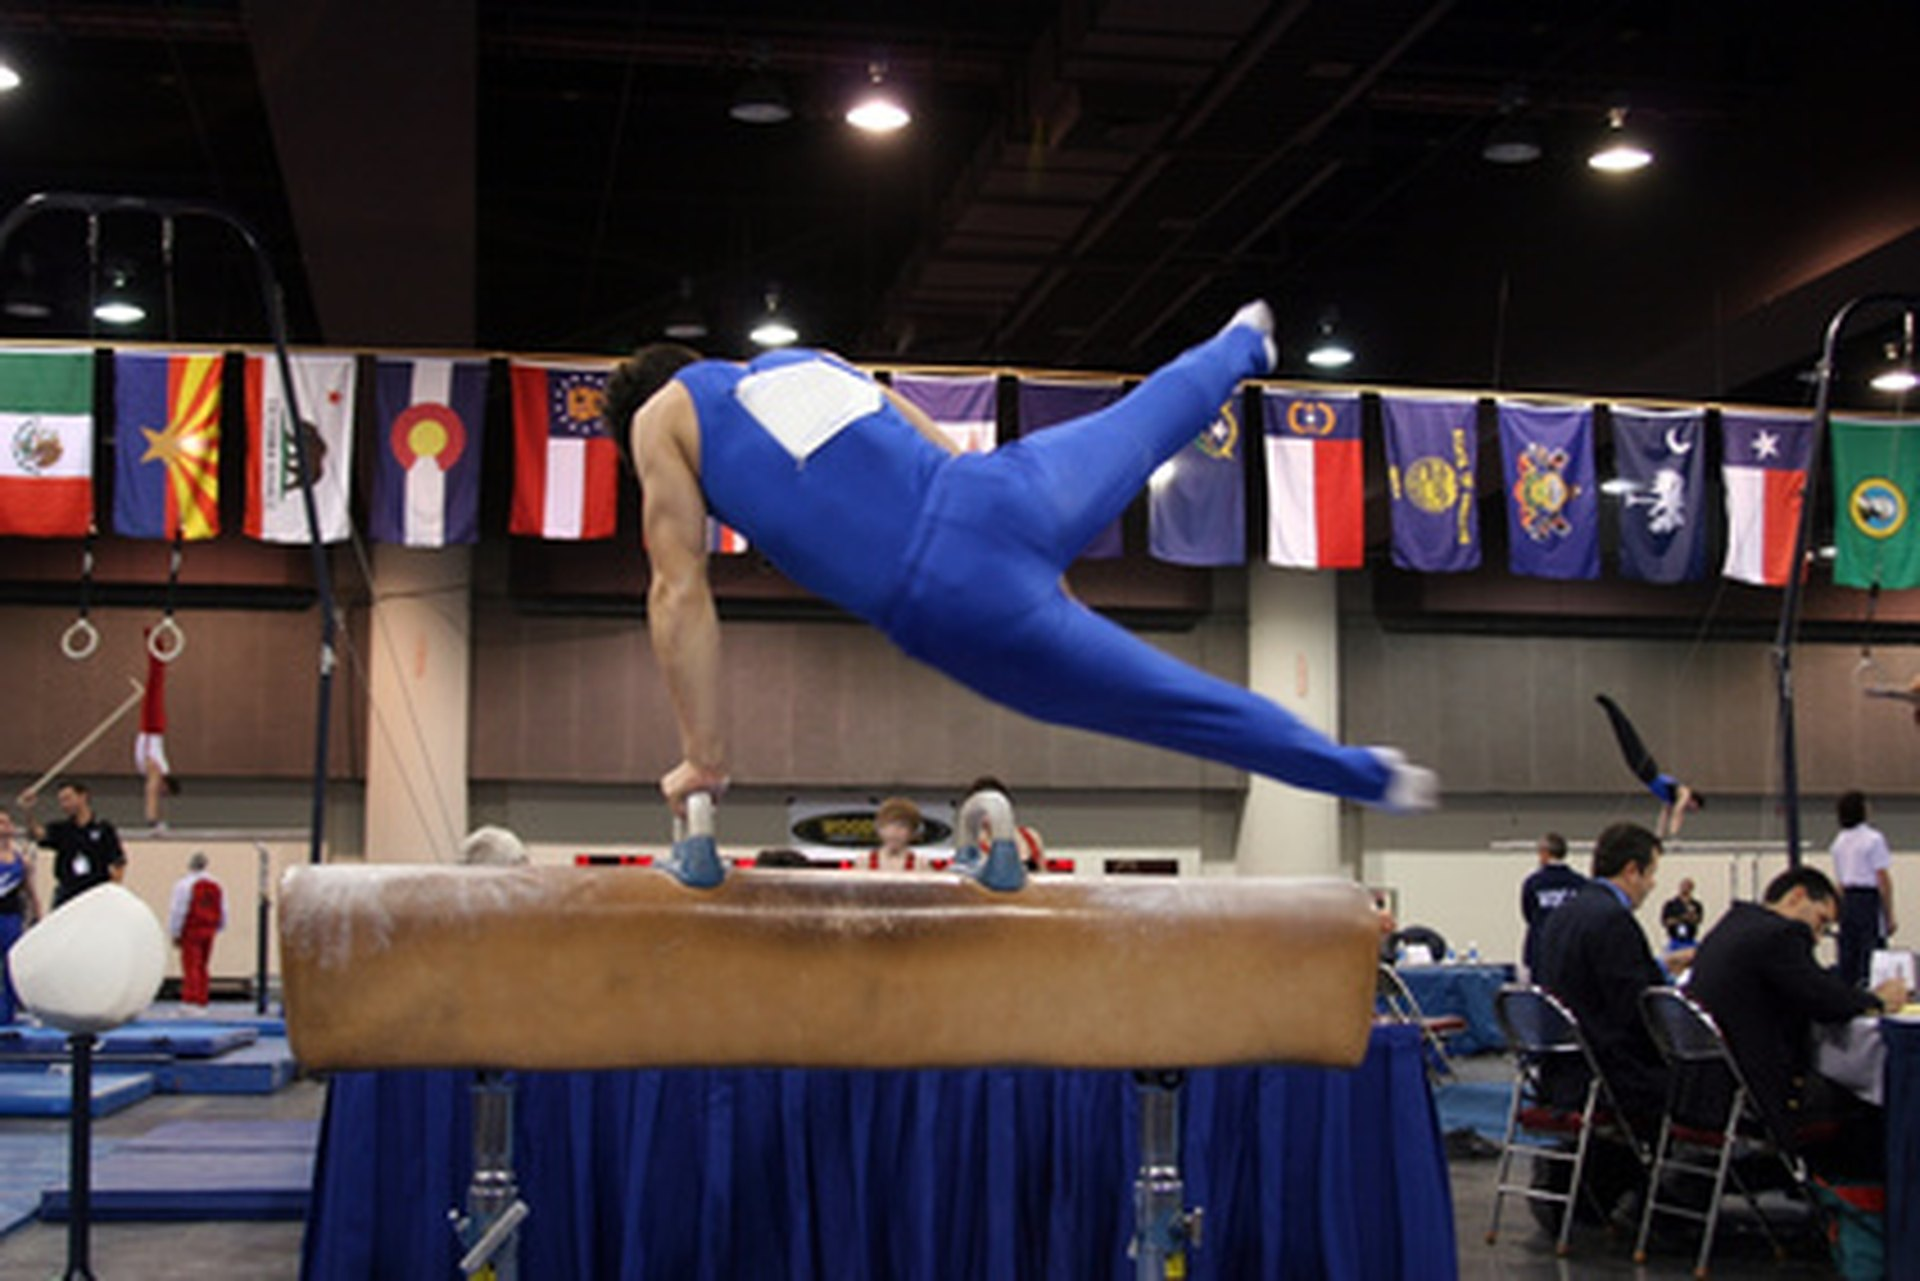 Childrens gymnastics: the basic rules of gymnastics